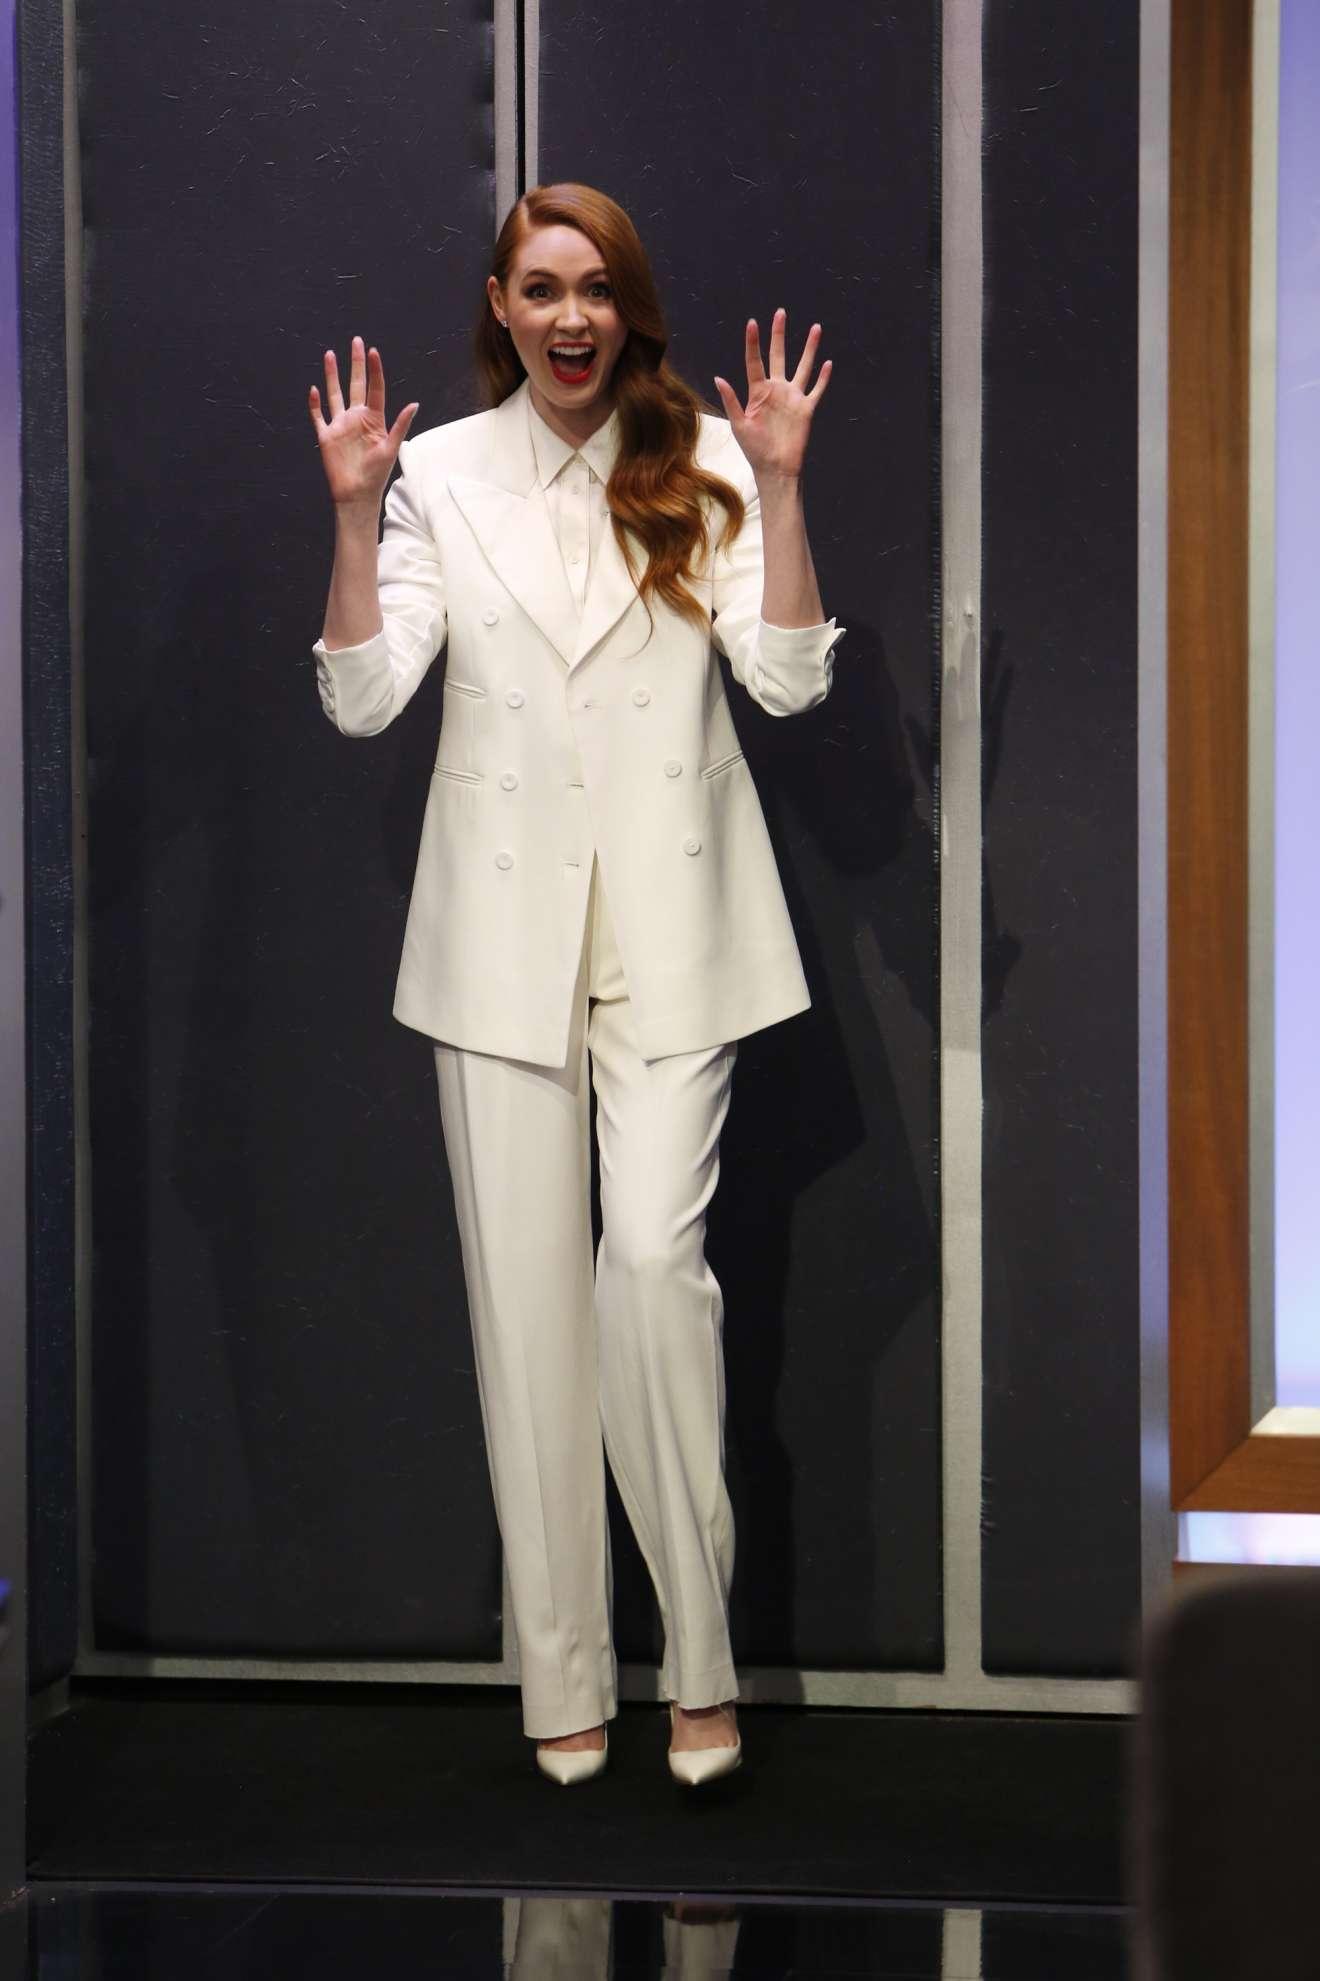 Karen Gillan – Appearance on Jimmy Kimmel Live in Hollywood